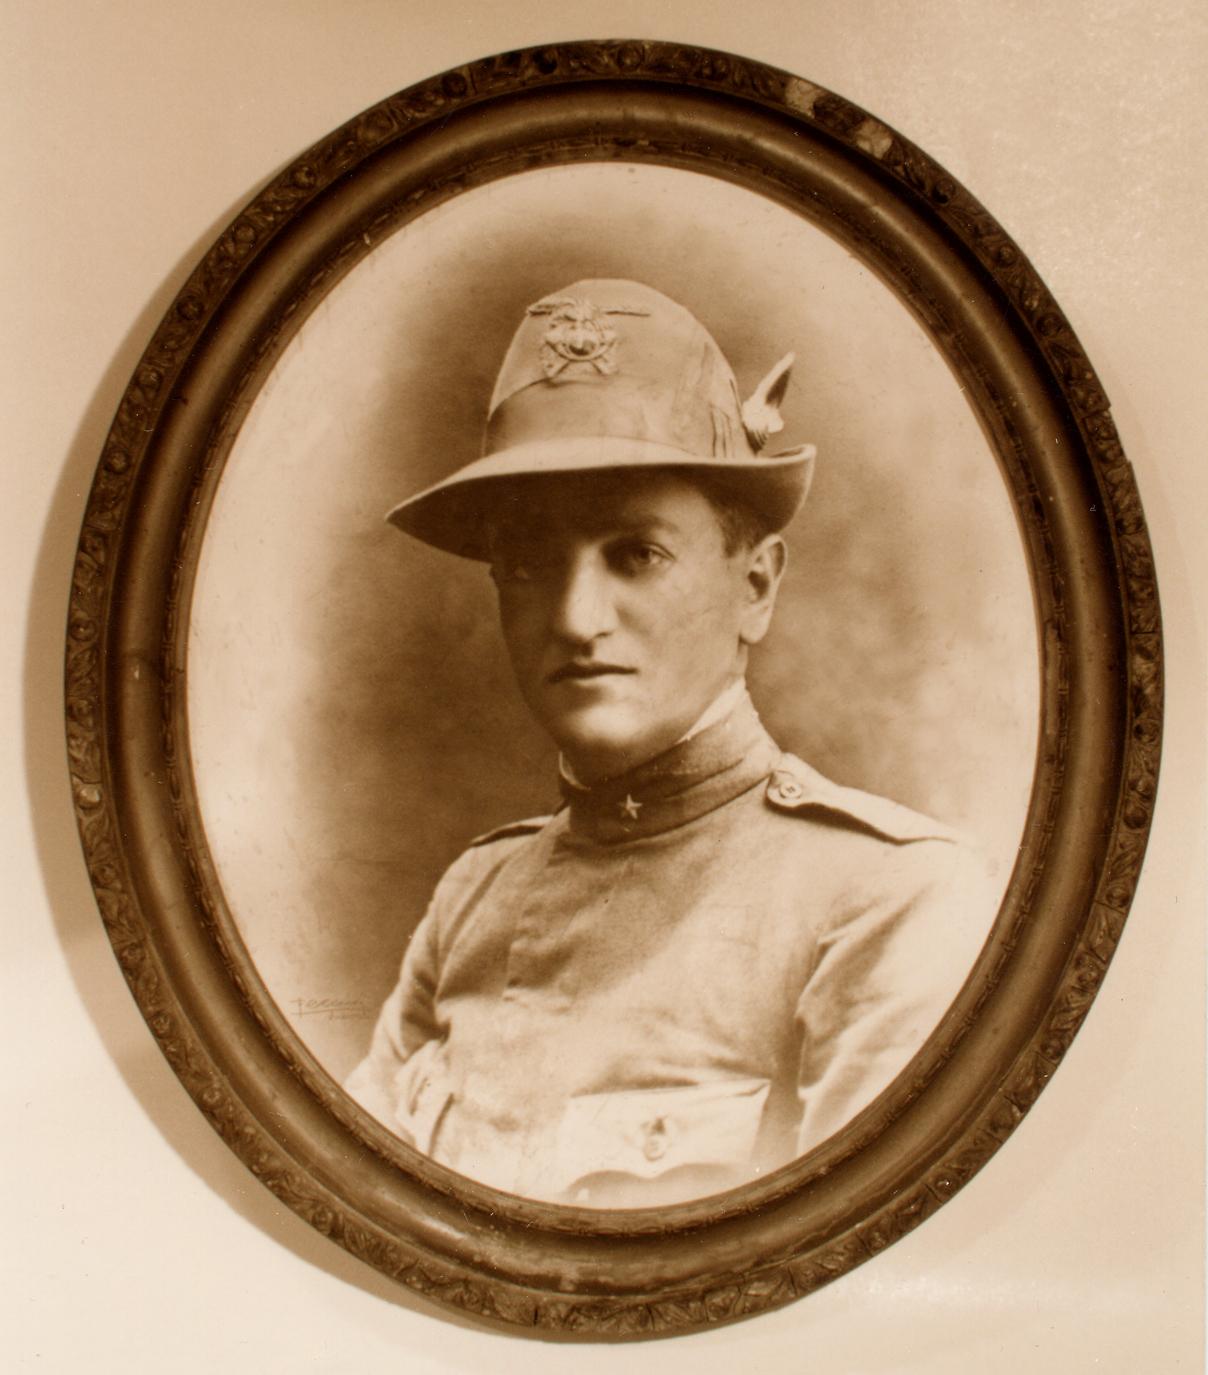 35 - Capitano degli Alpini - Busa Enrico.jpg